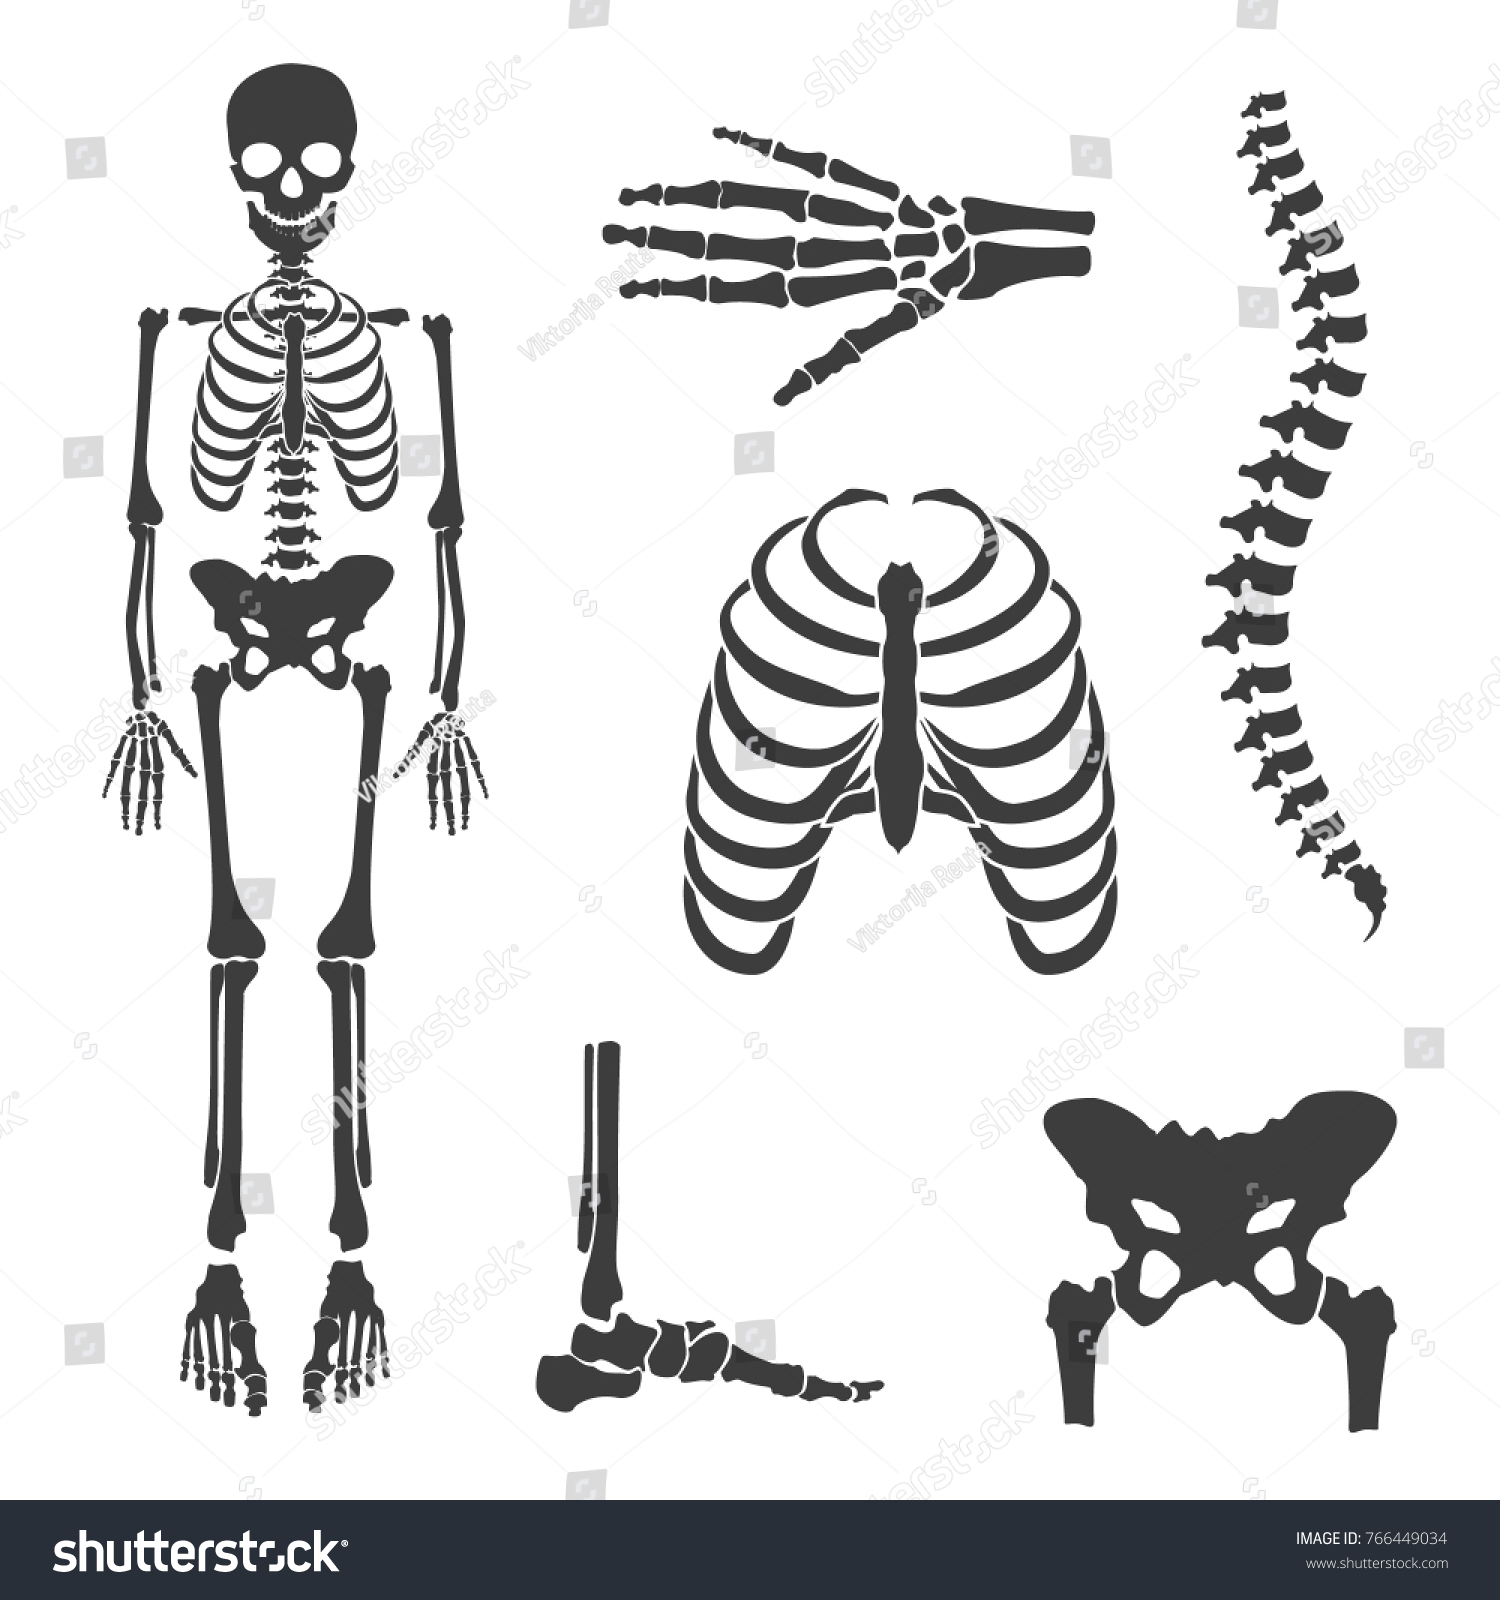 Vector Illustration Parts Human Skeleton Human Stock Vector ...